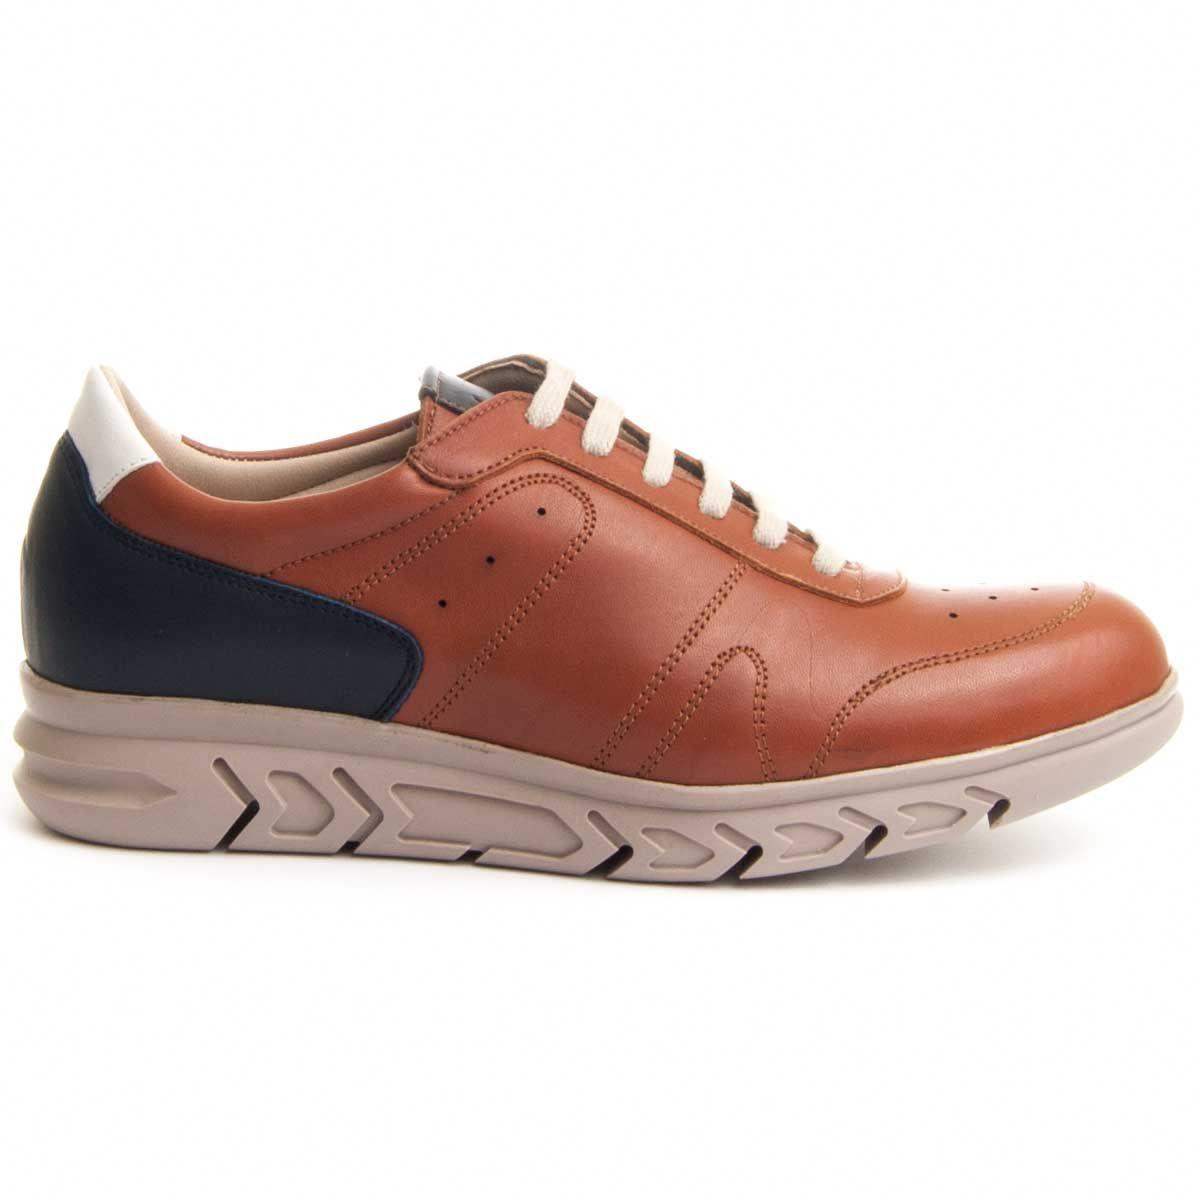 Purapiel Comfortable Sneaker in Camel